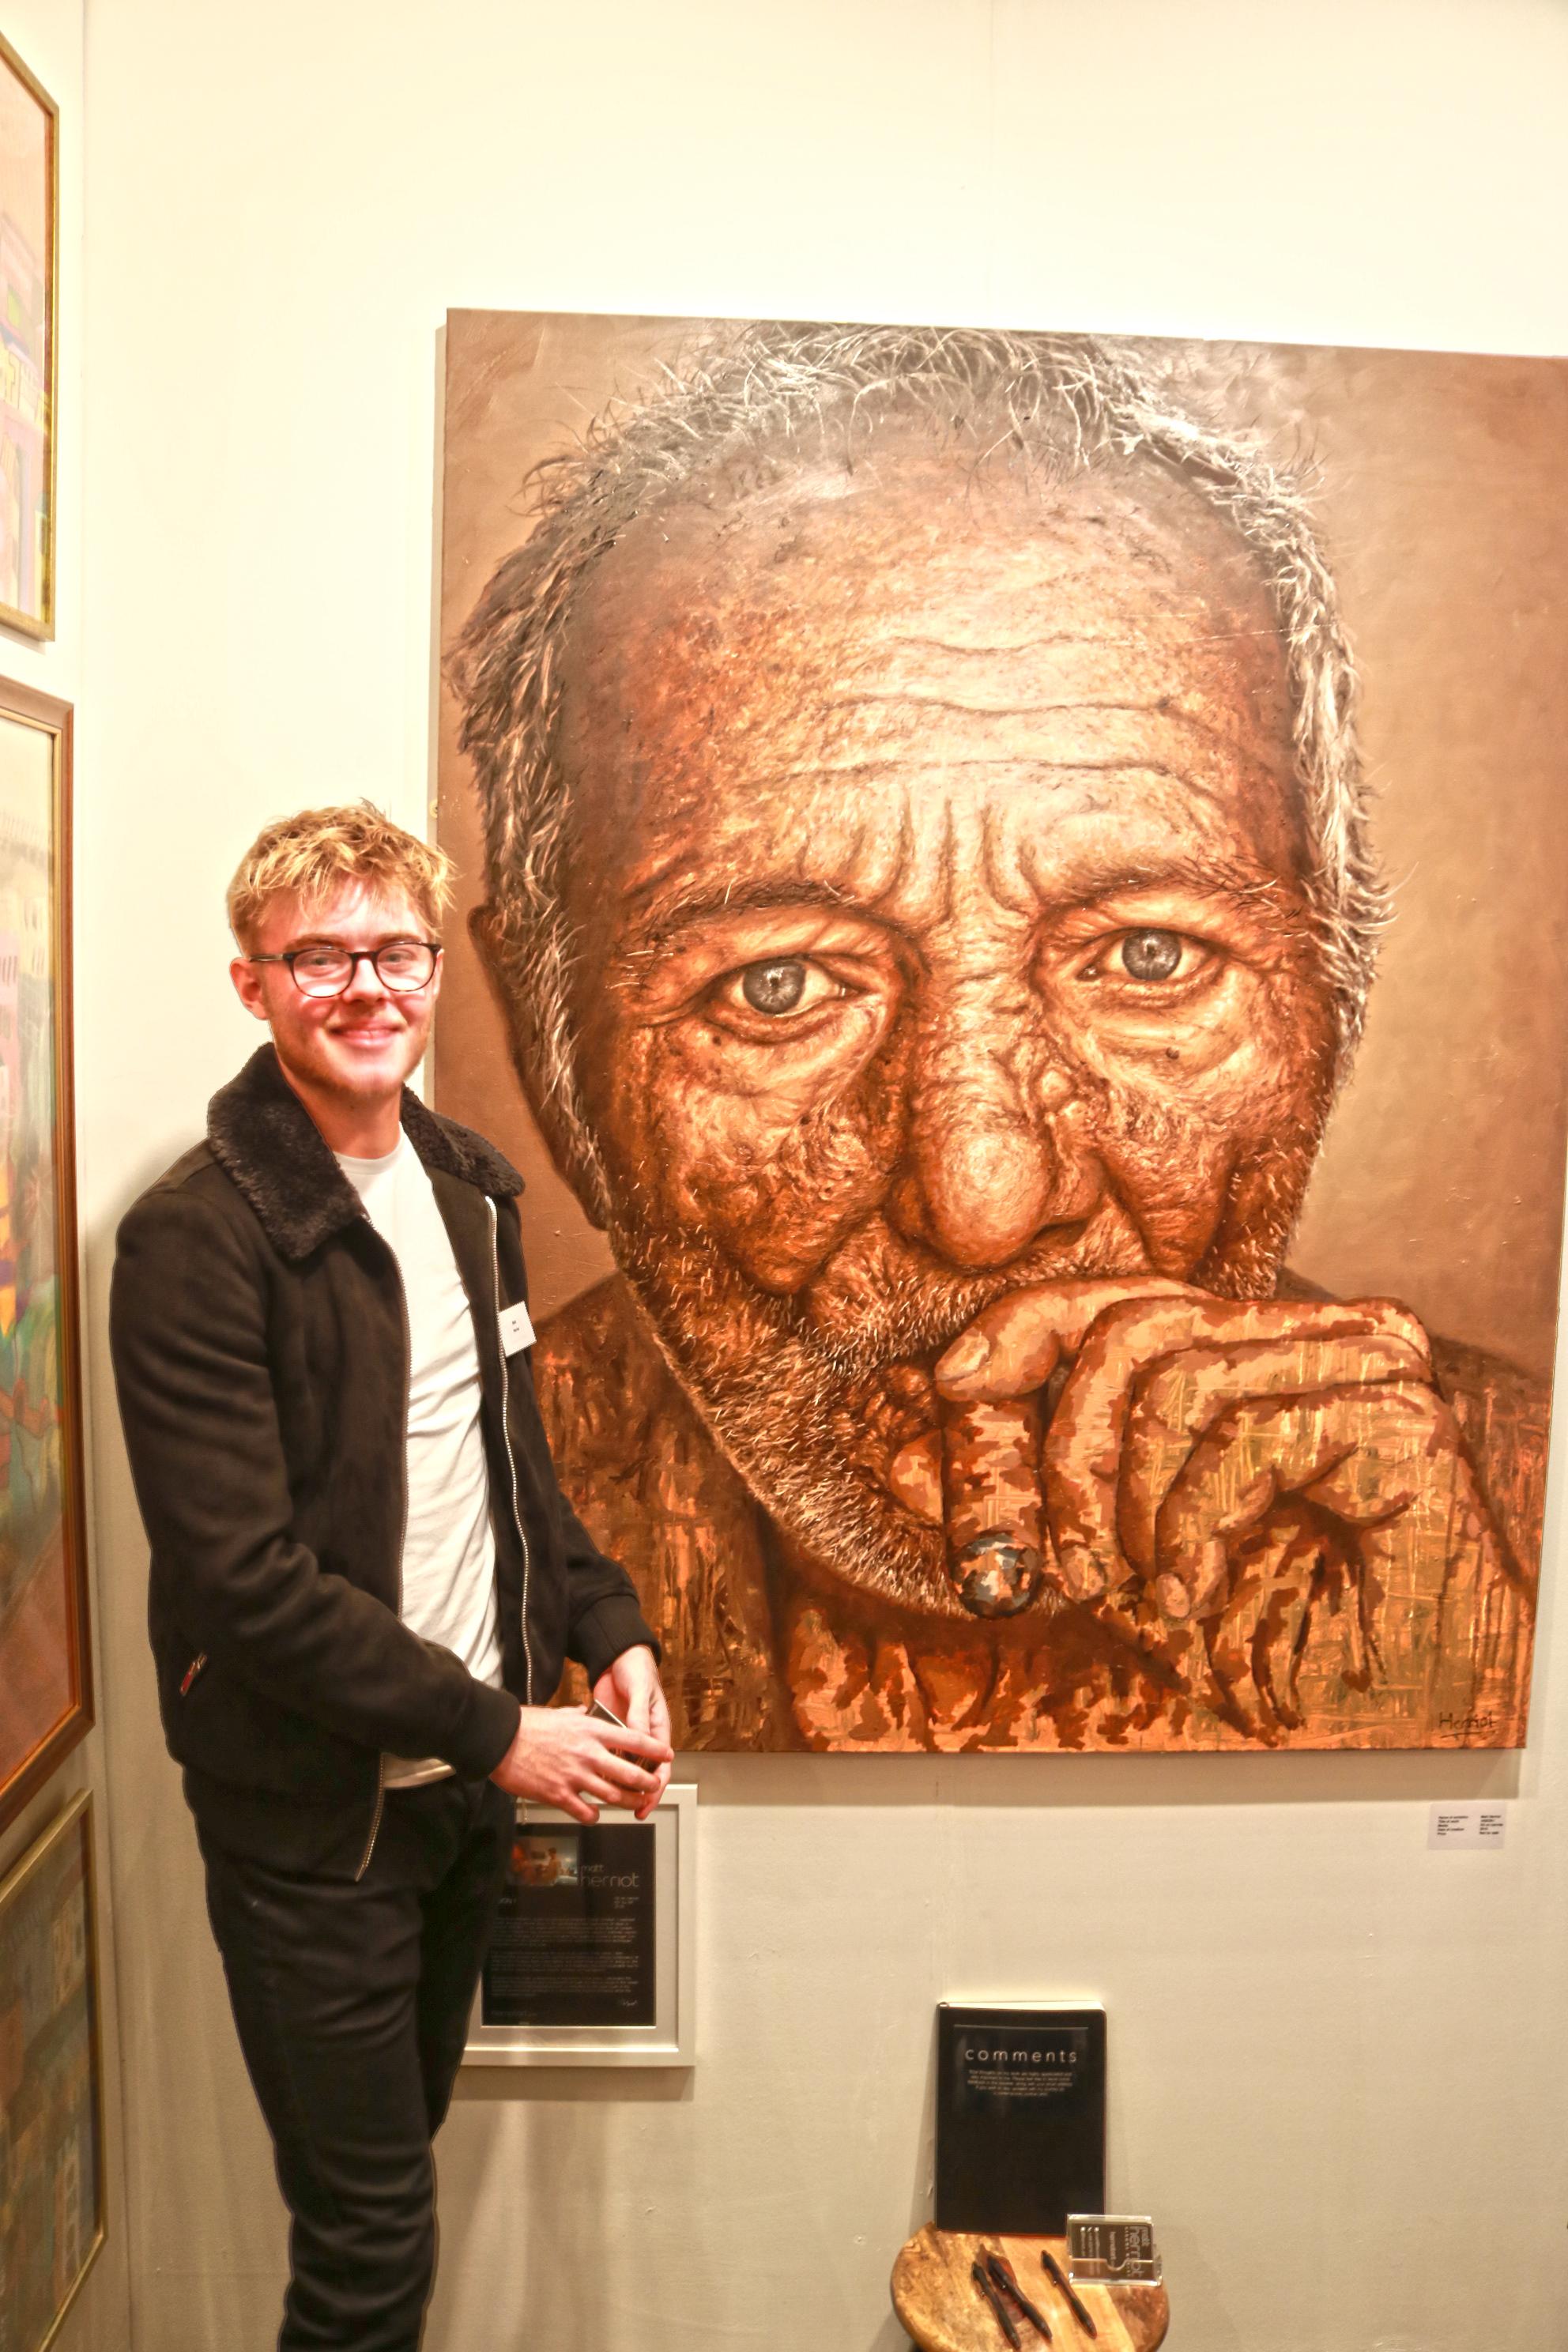 Matt Herriot and his painting at the Parallax art fair in London